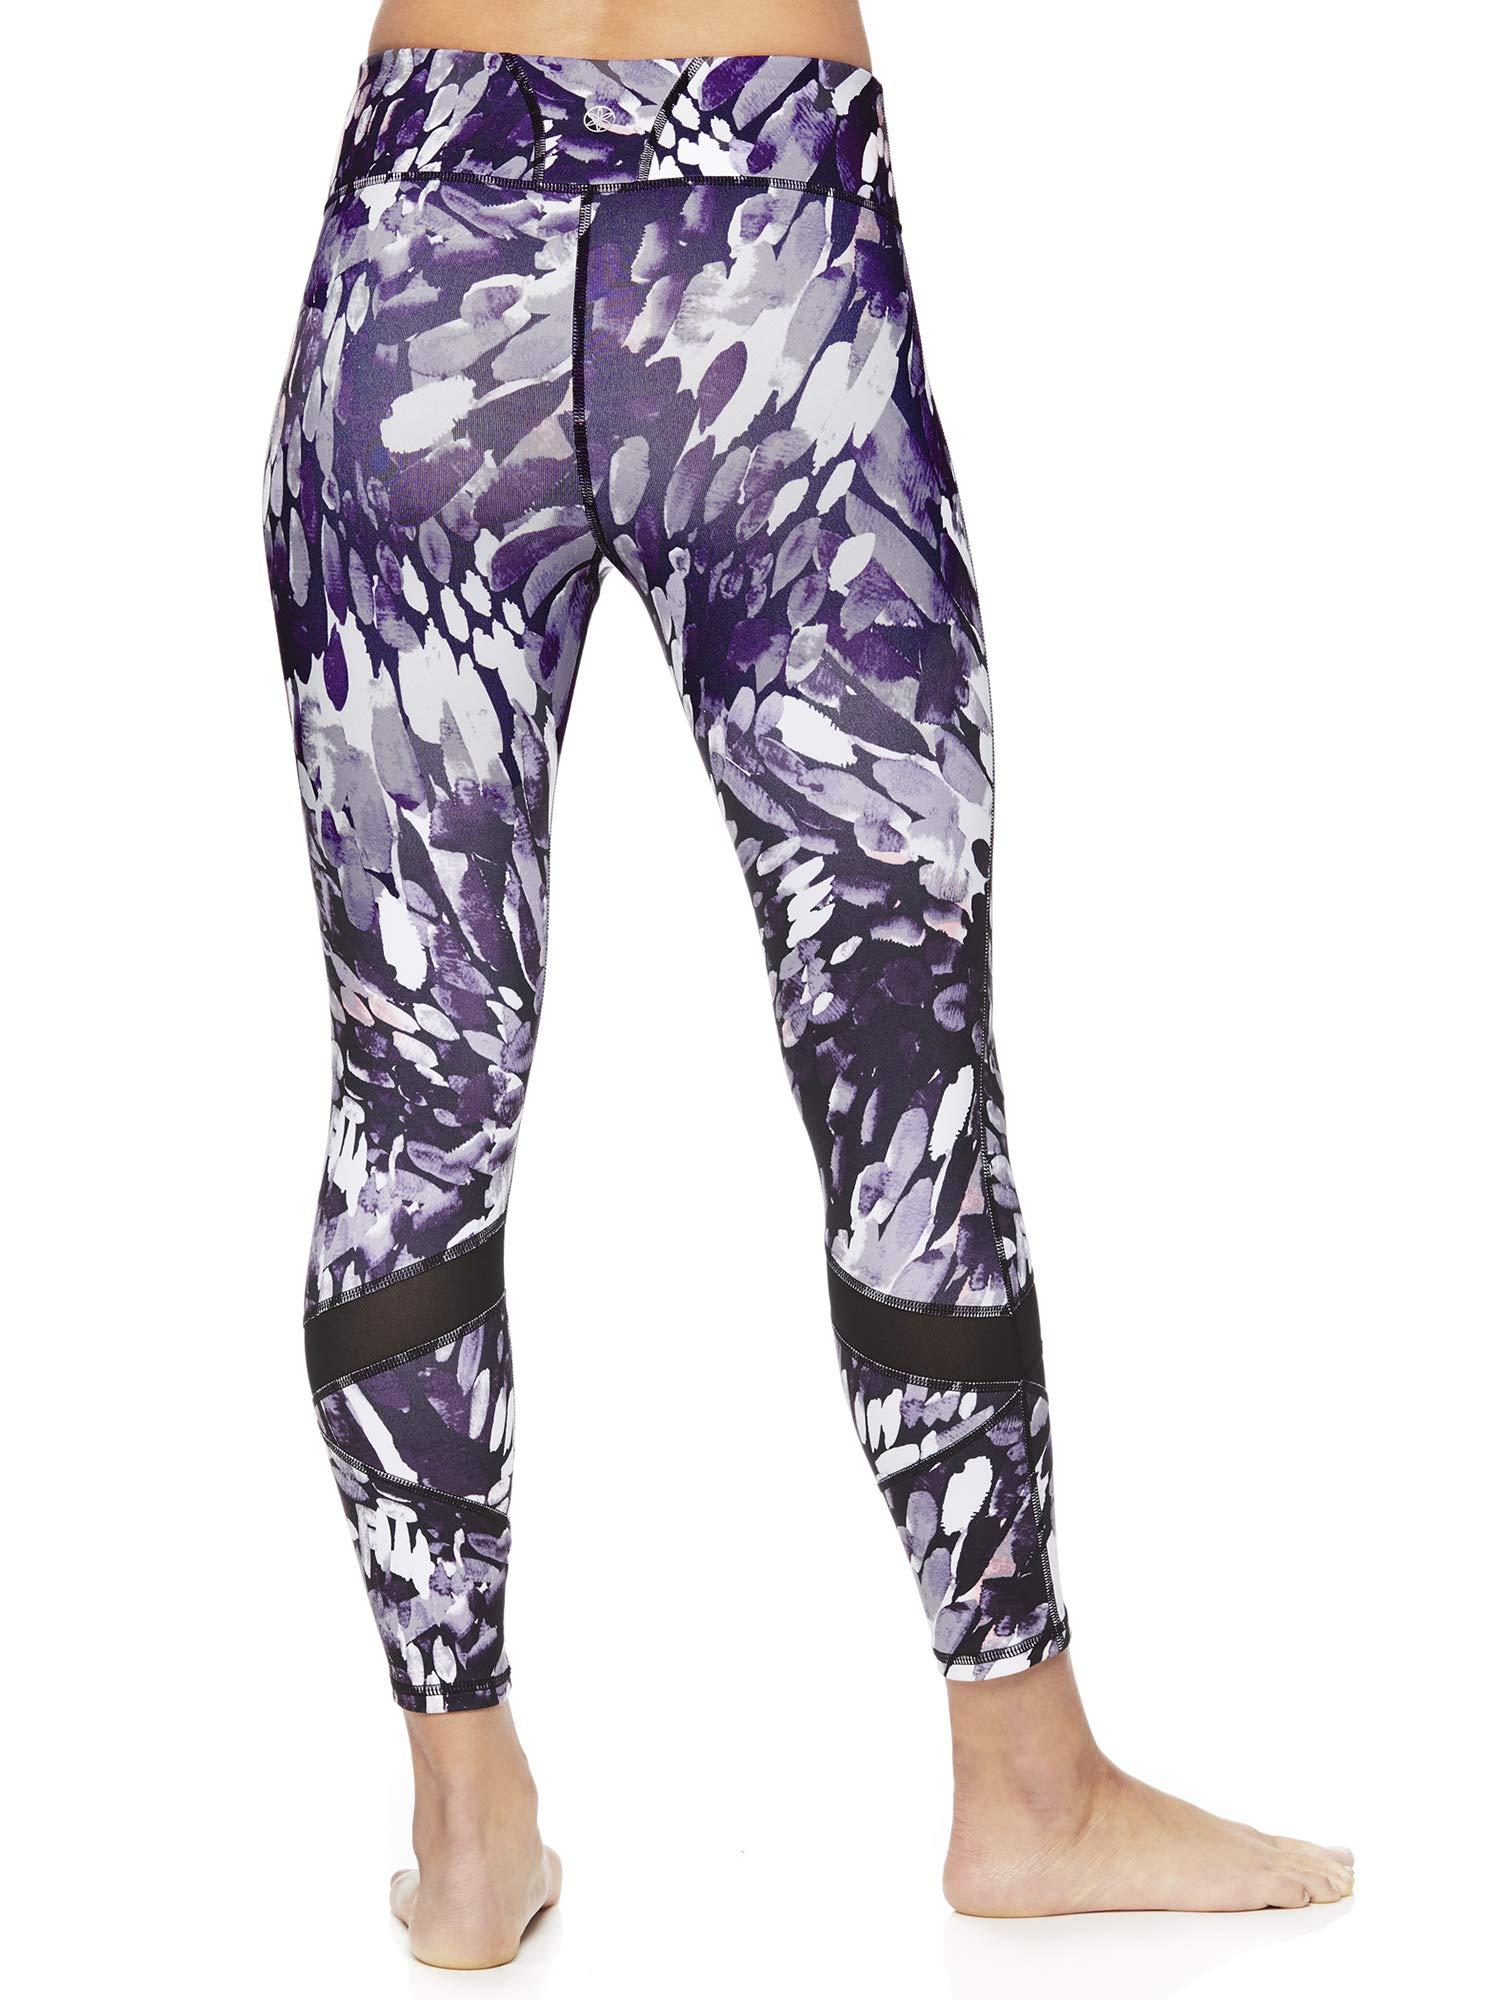 Gaiam Women's Capri Yoga Pants - Performance Spandex Compression Legging - Black Dawn Print, X-Small